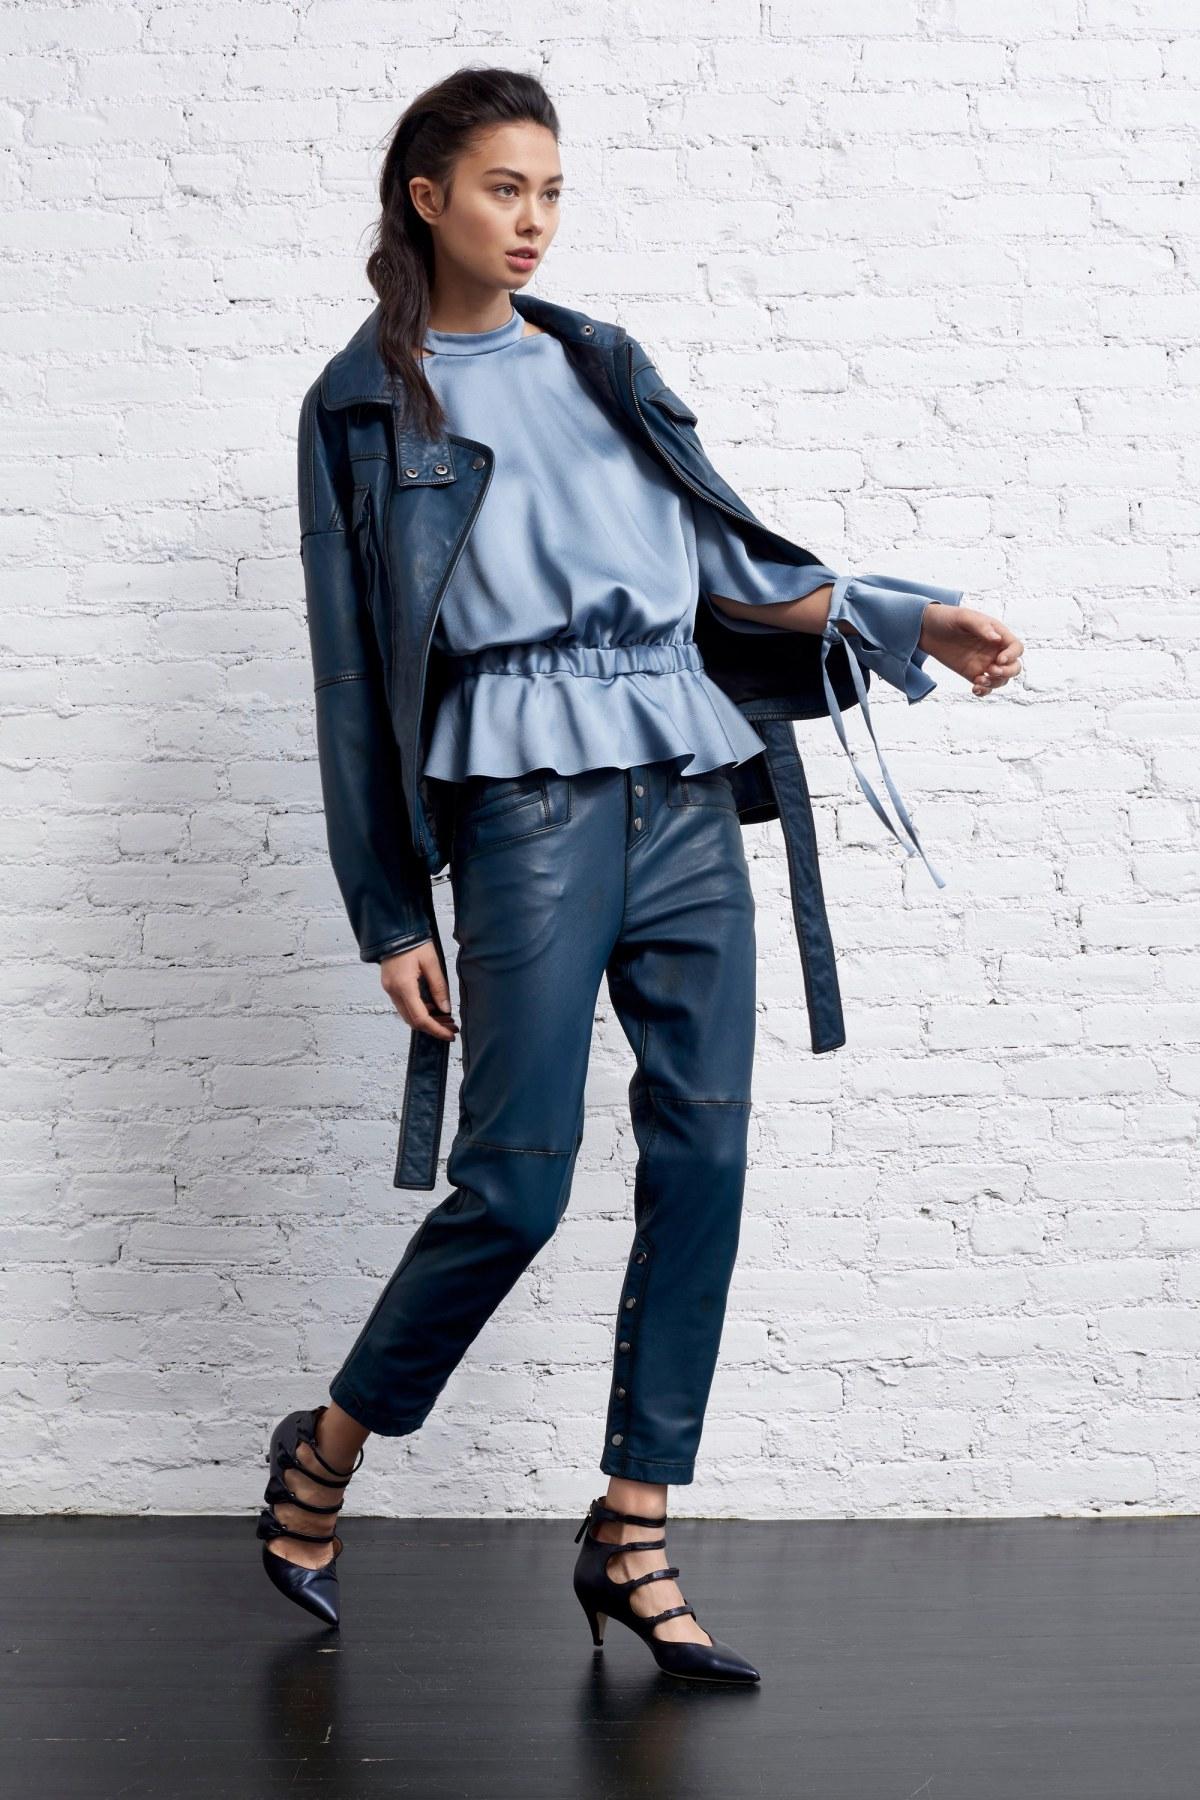 marissa-webb-pre-fall-2017-fashion-show-the-impression-15